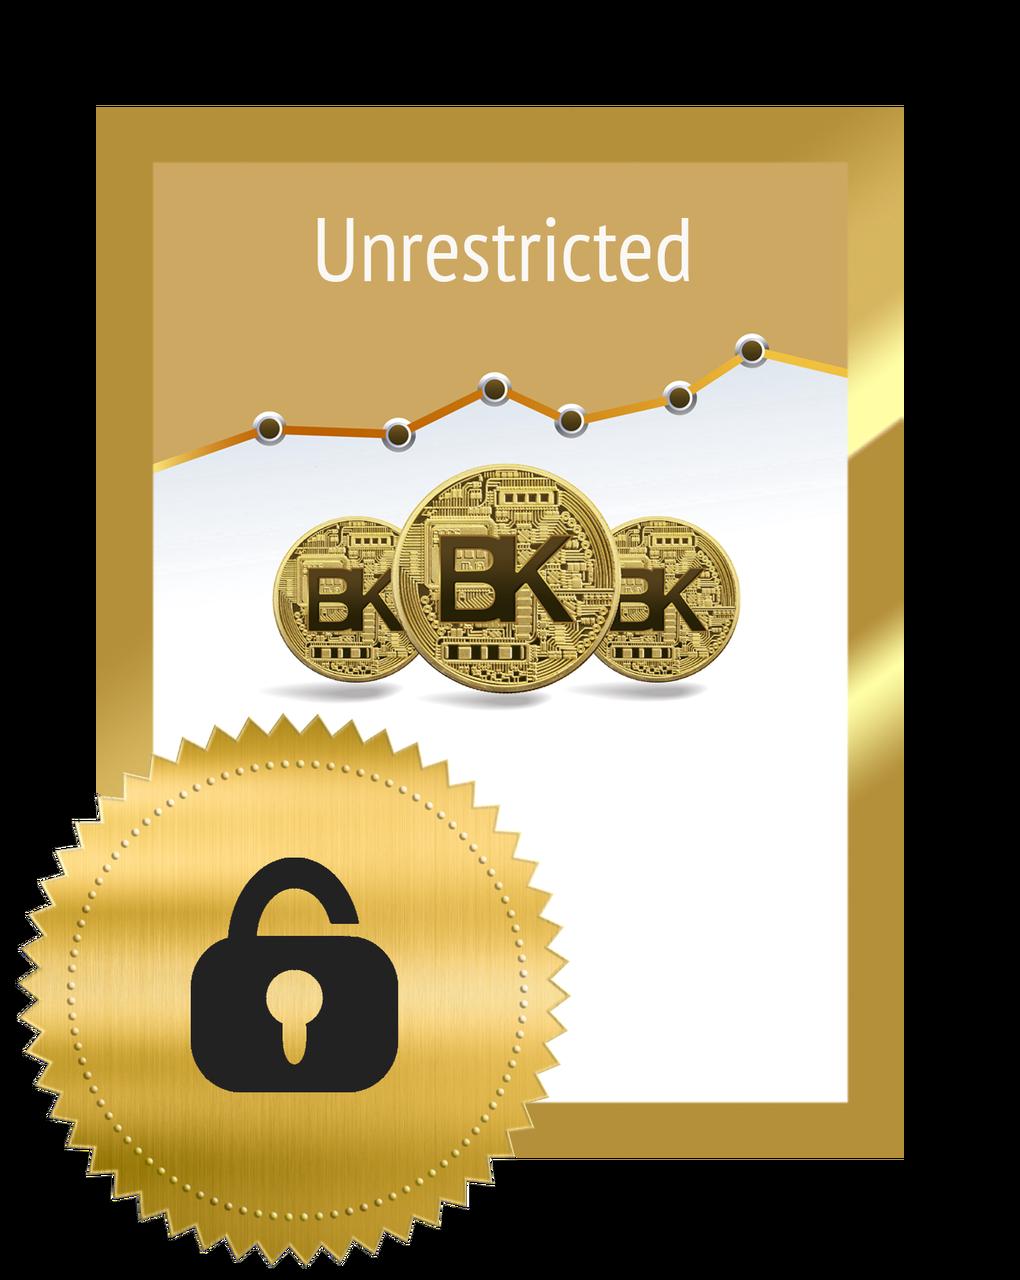 Unrestricted Blockkoin: 1 BK-Koin = $1.88 Sold in Blocks of 10